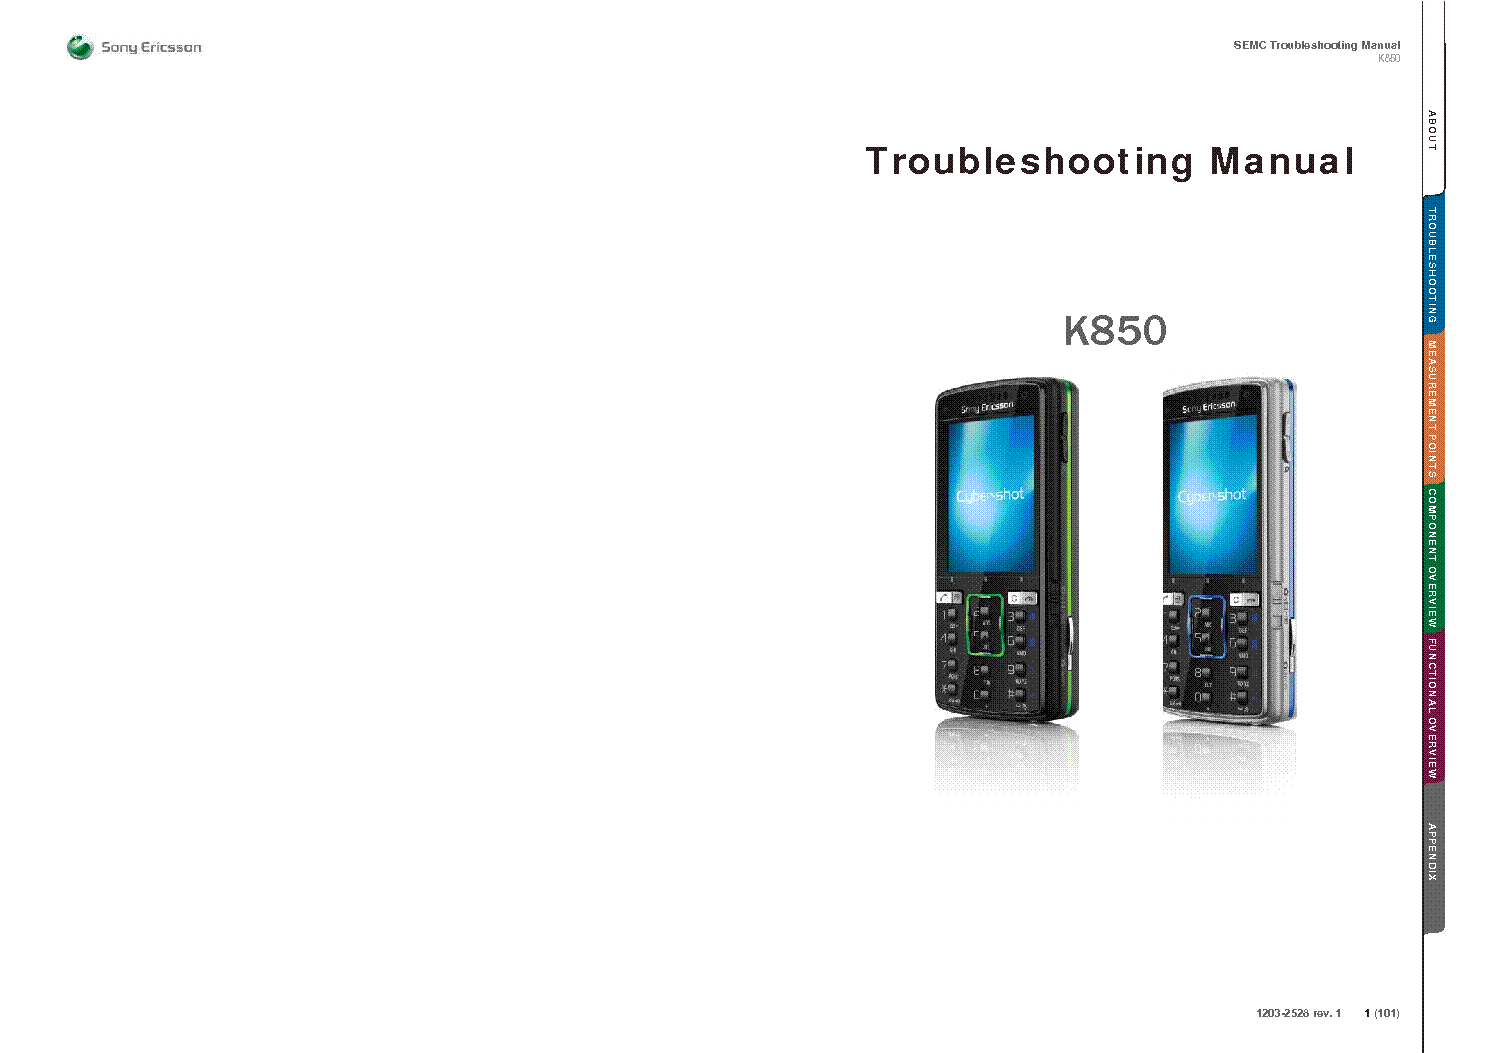 sony ericsson w660i service manual download schematics eeprom rh elektrotanya com Sony Ericsson P990 Sony Ericsson P-800